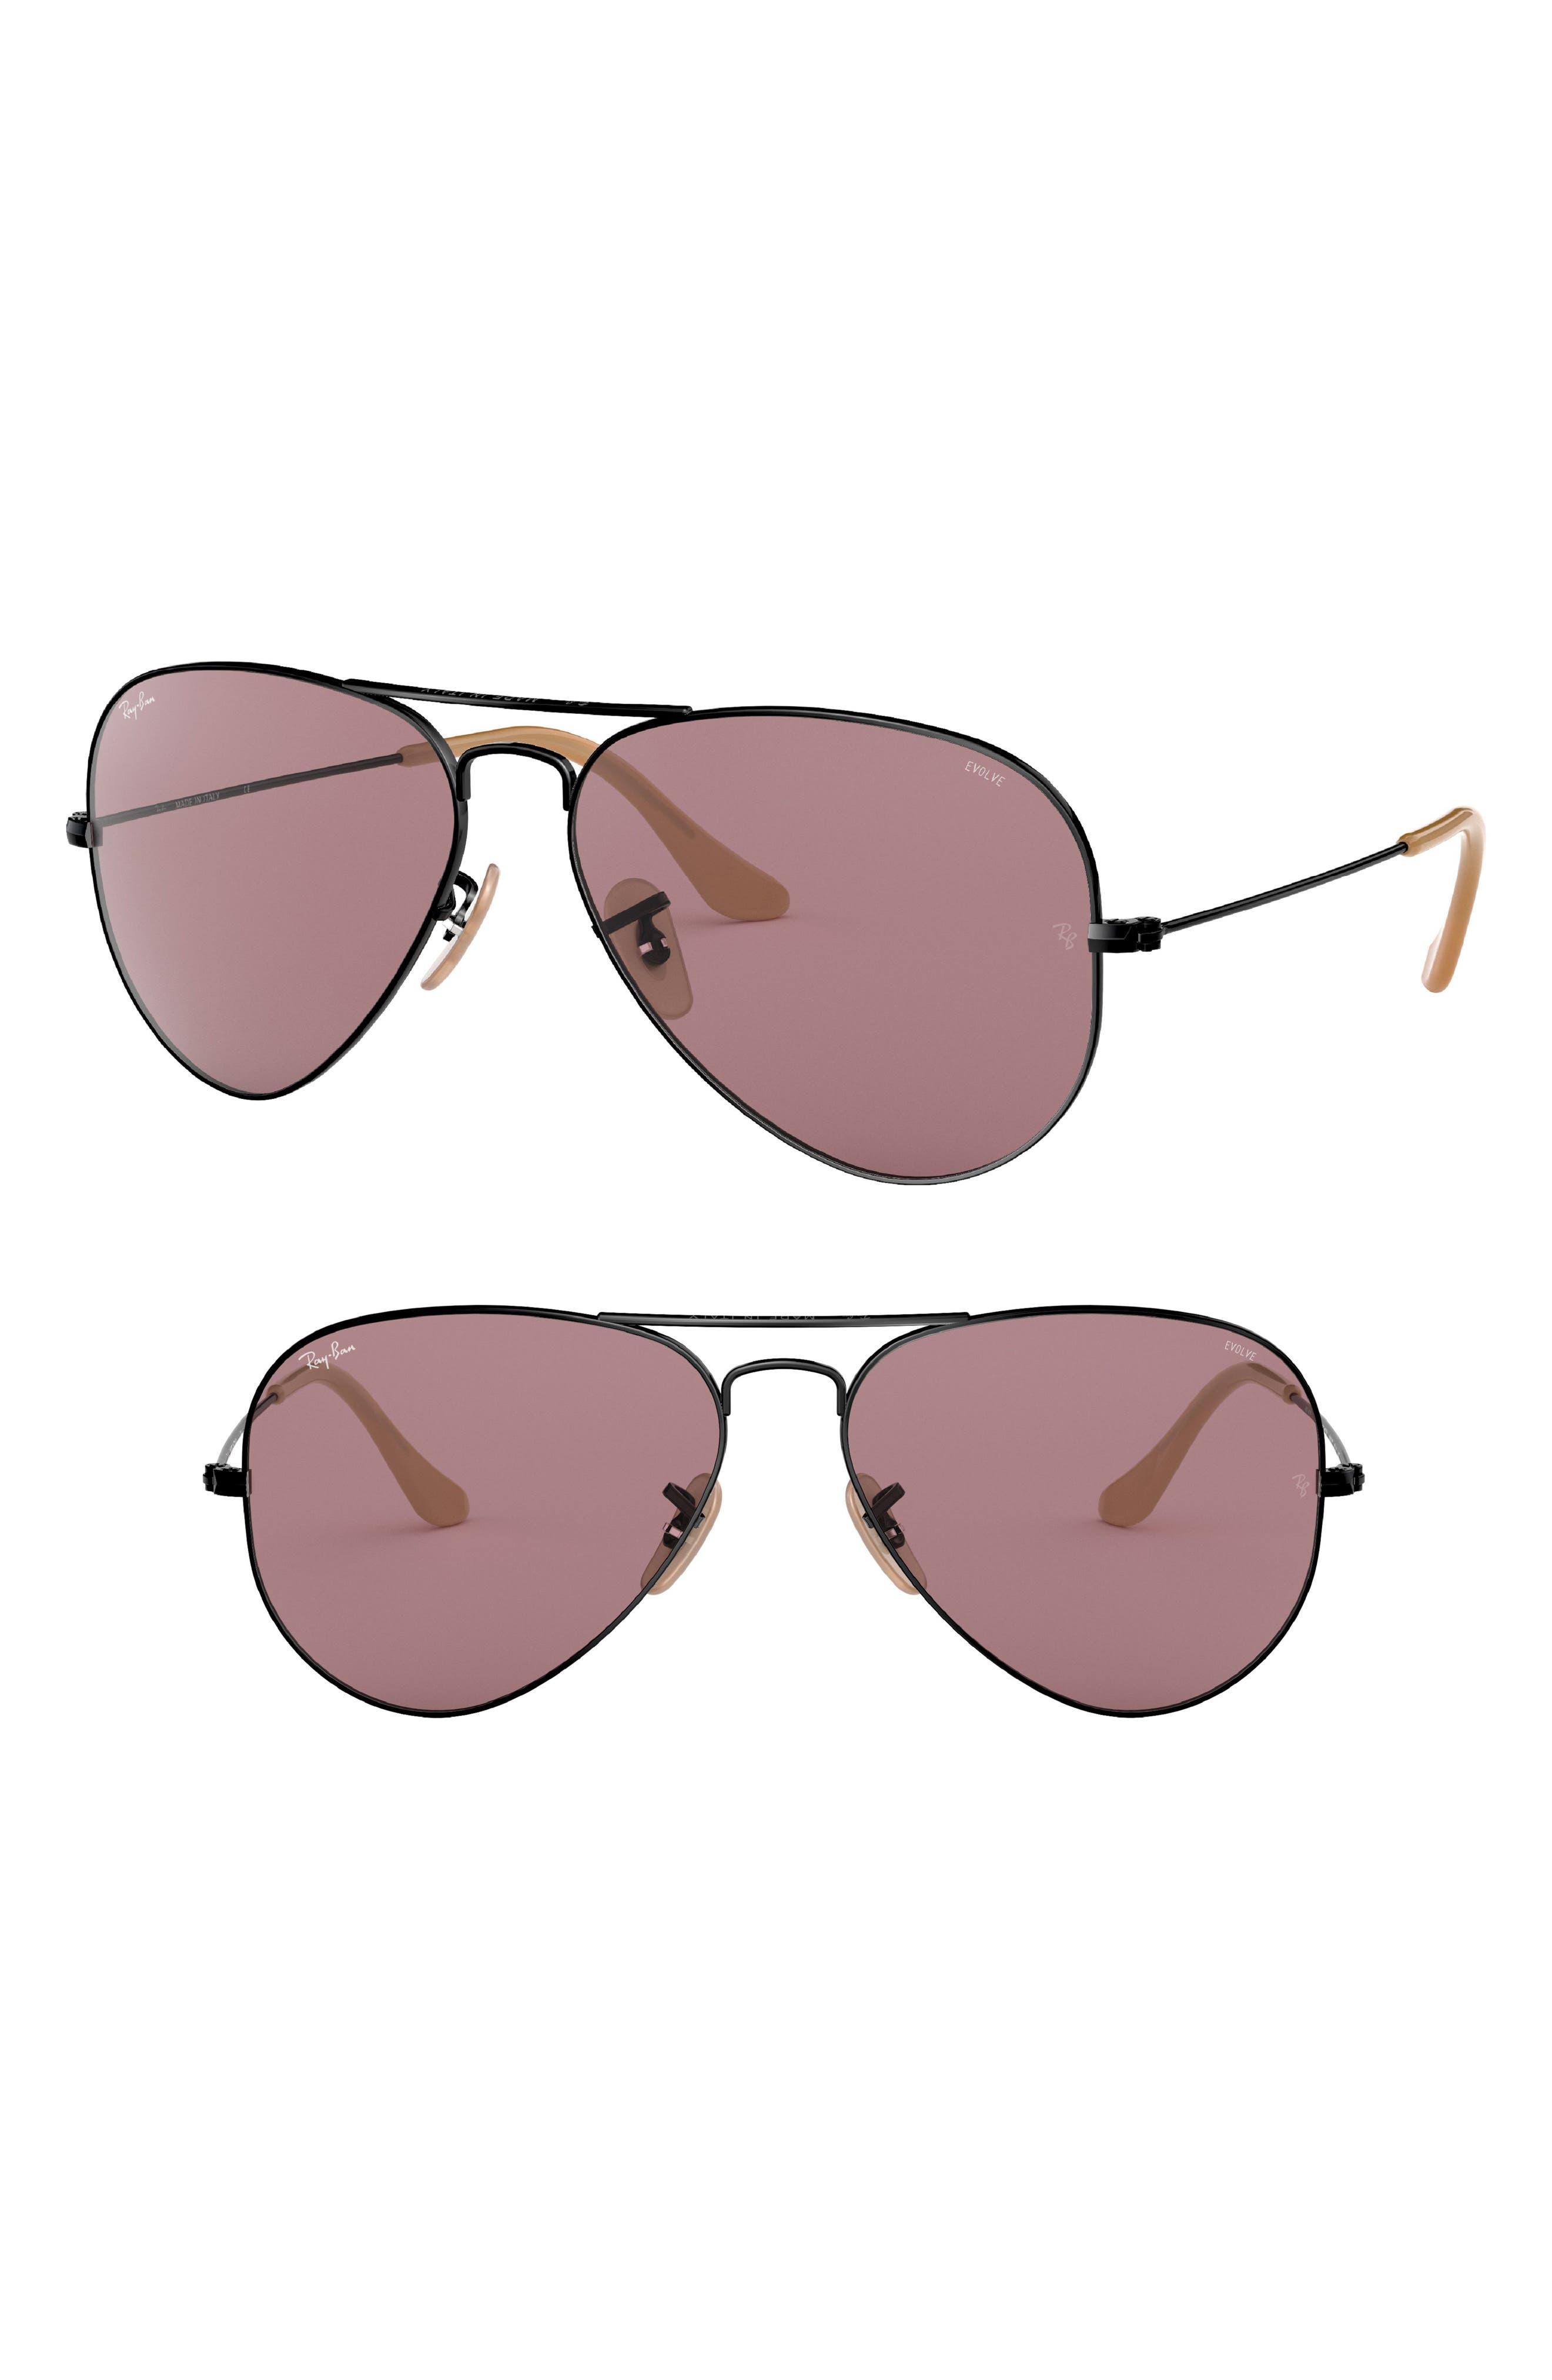 Evolve 55mm Photochromic Aviator Sunglasses,                             Main thumbnail 1, color,                             Violet